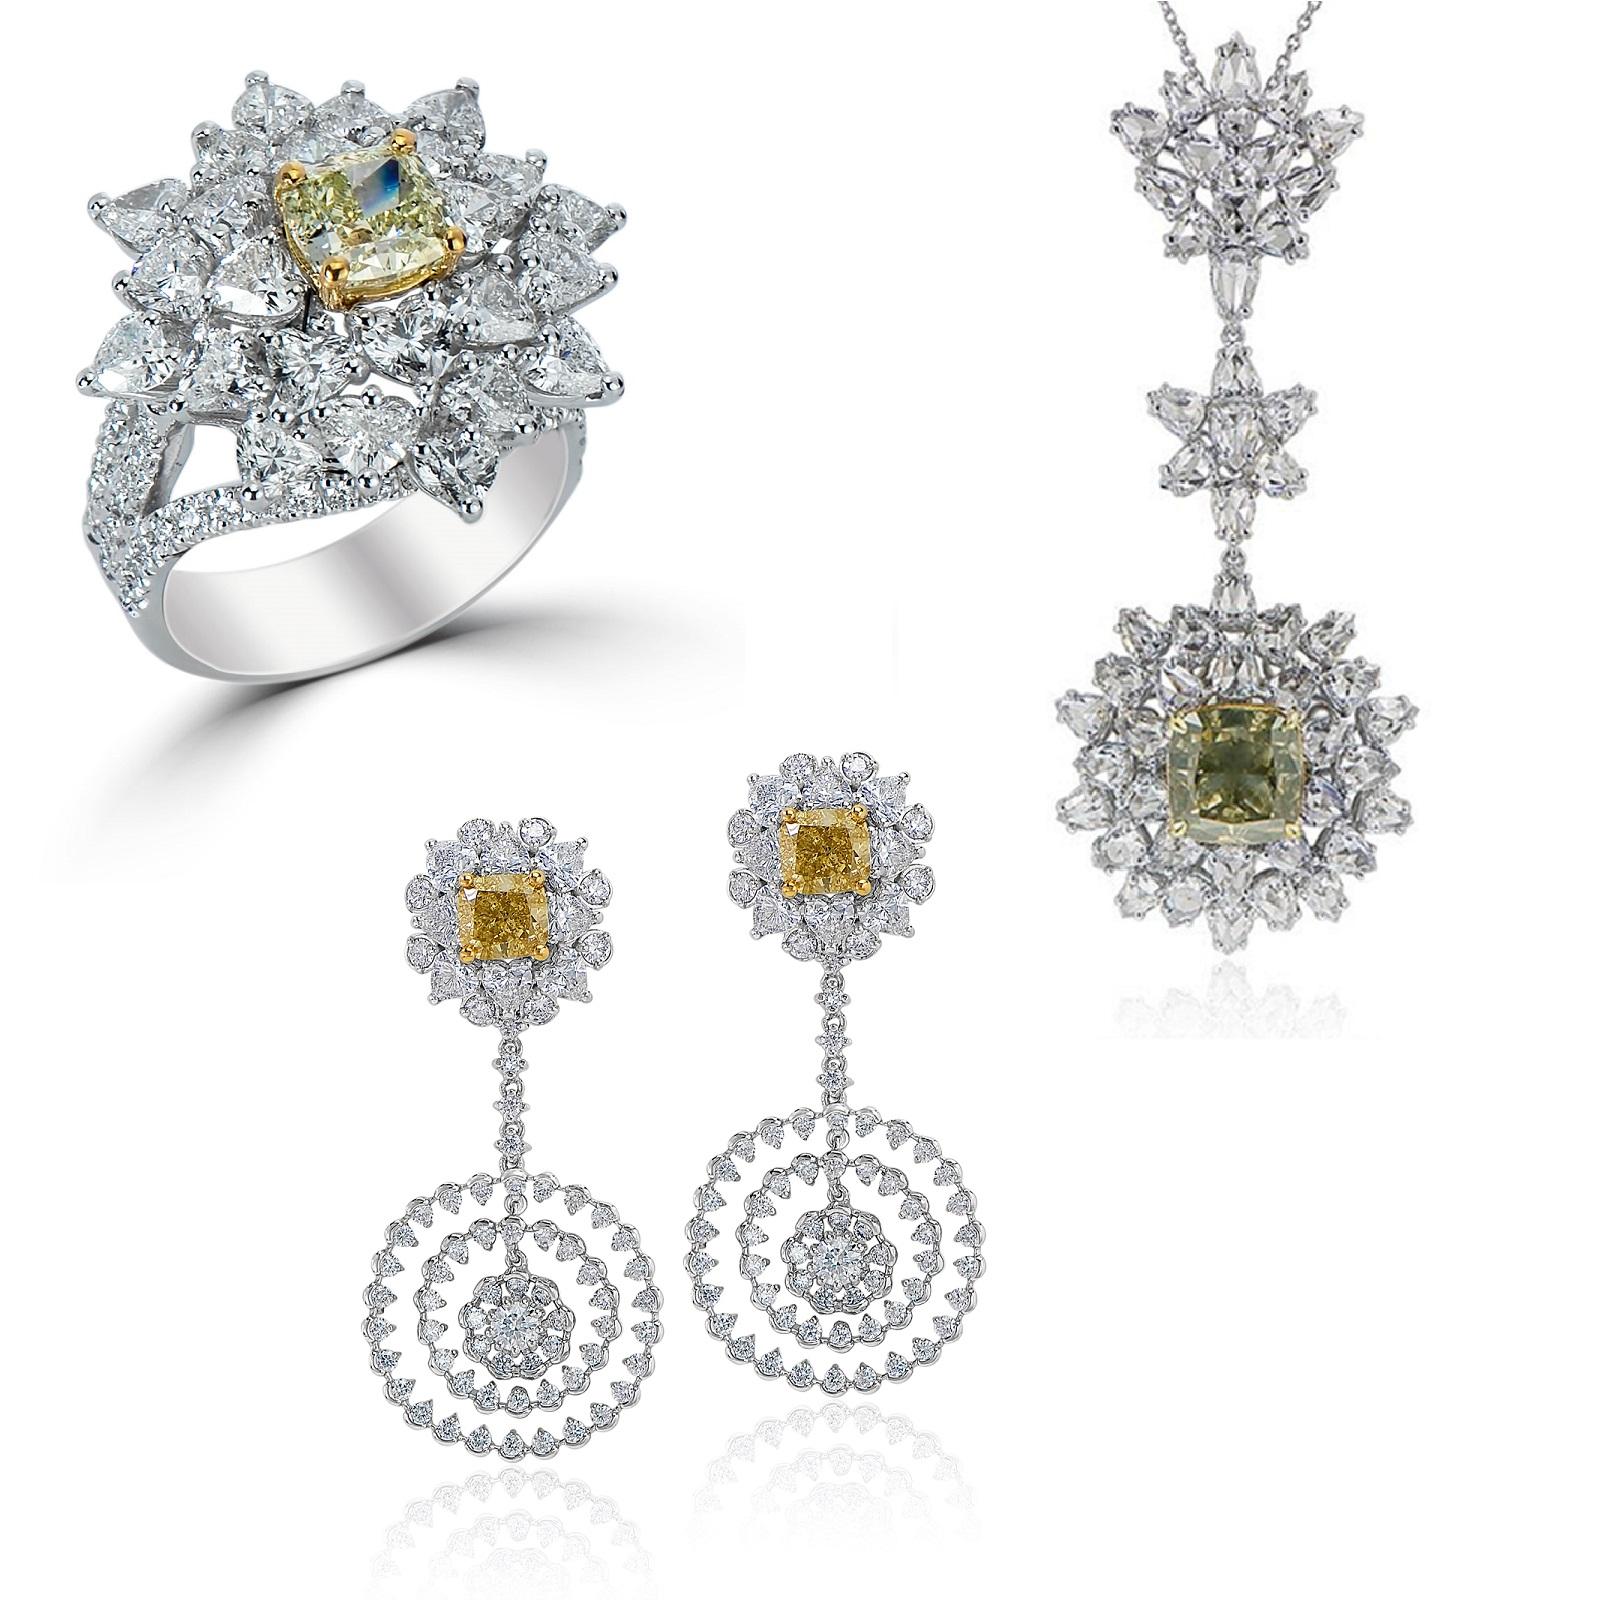 Mixed Yellow & Green Diamond Ring, Pendant & Earrings Set (25.98ct TW)